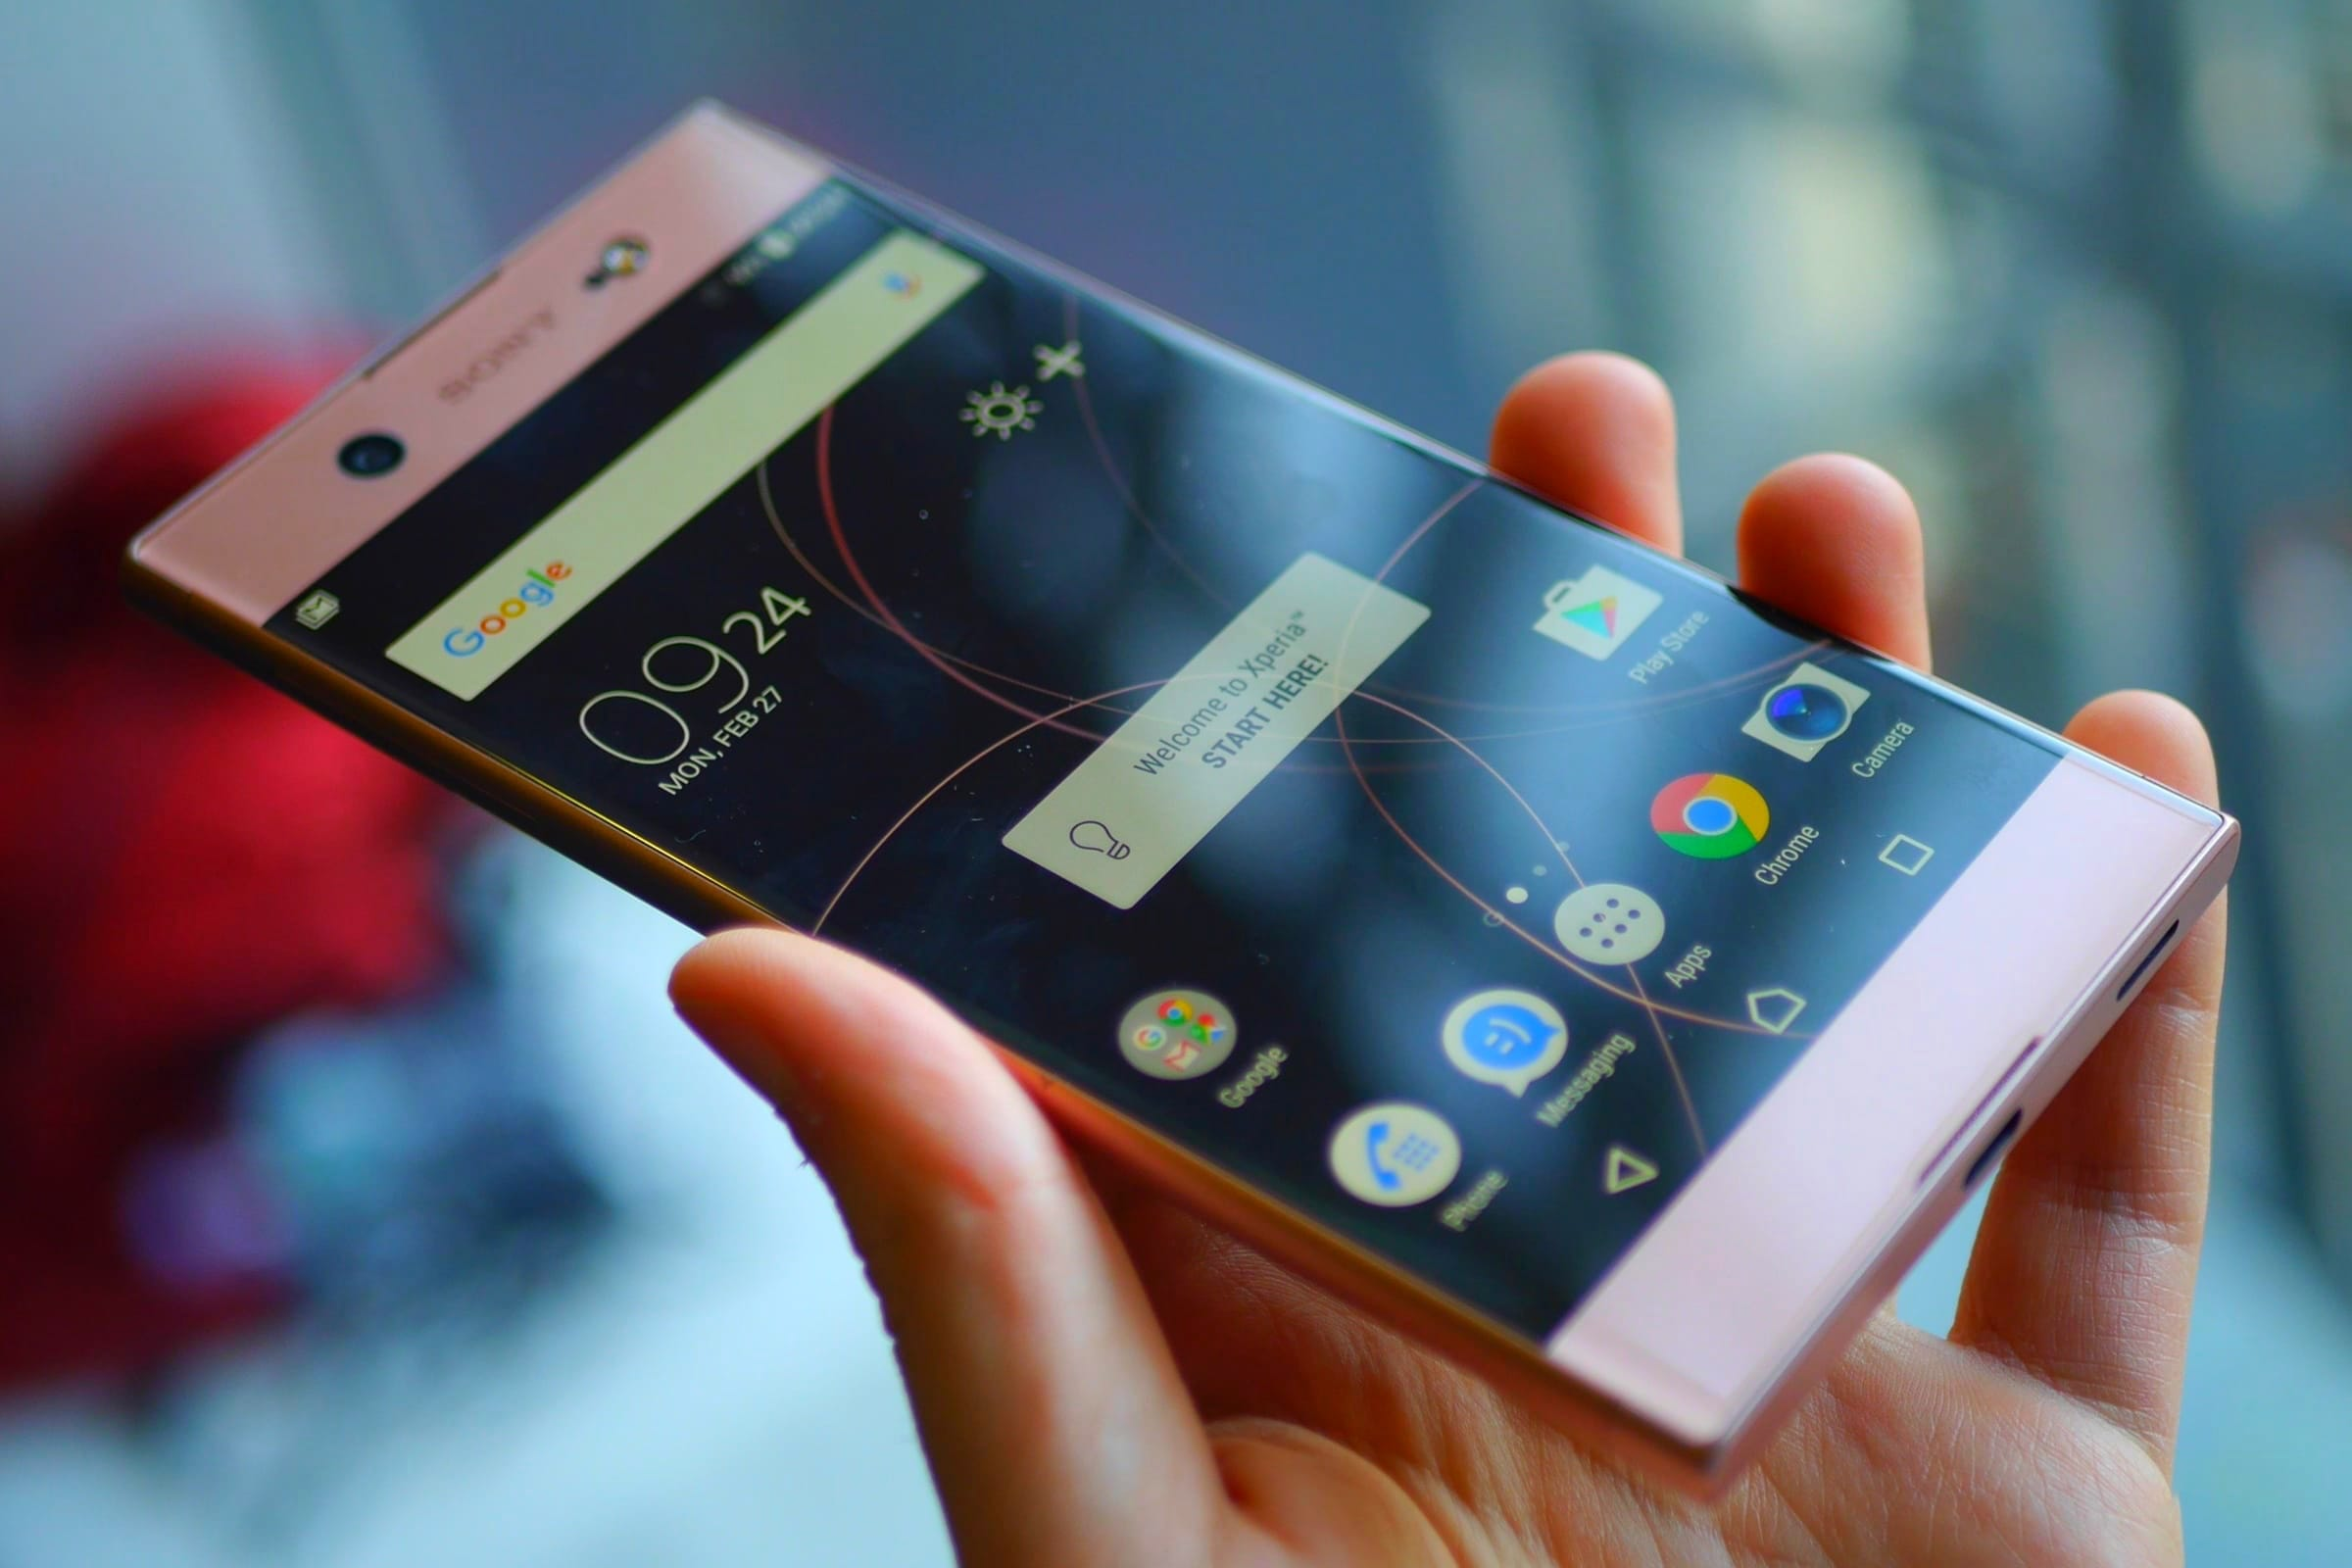 Флагманский смартфон Сони Xperia XZ2 Compact появился на«живой» фотографии